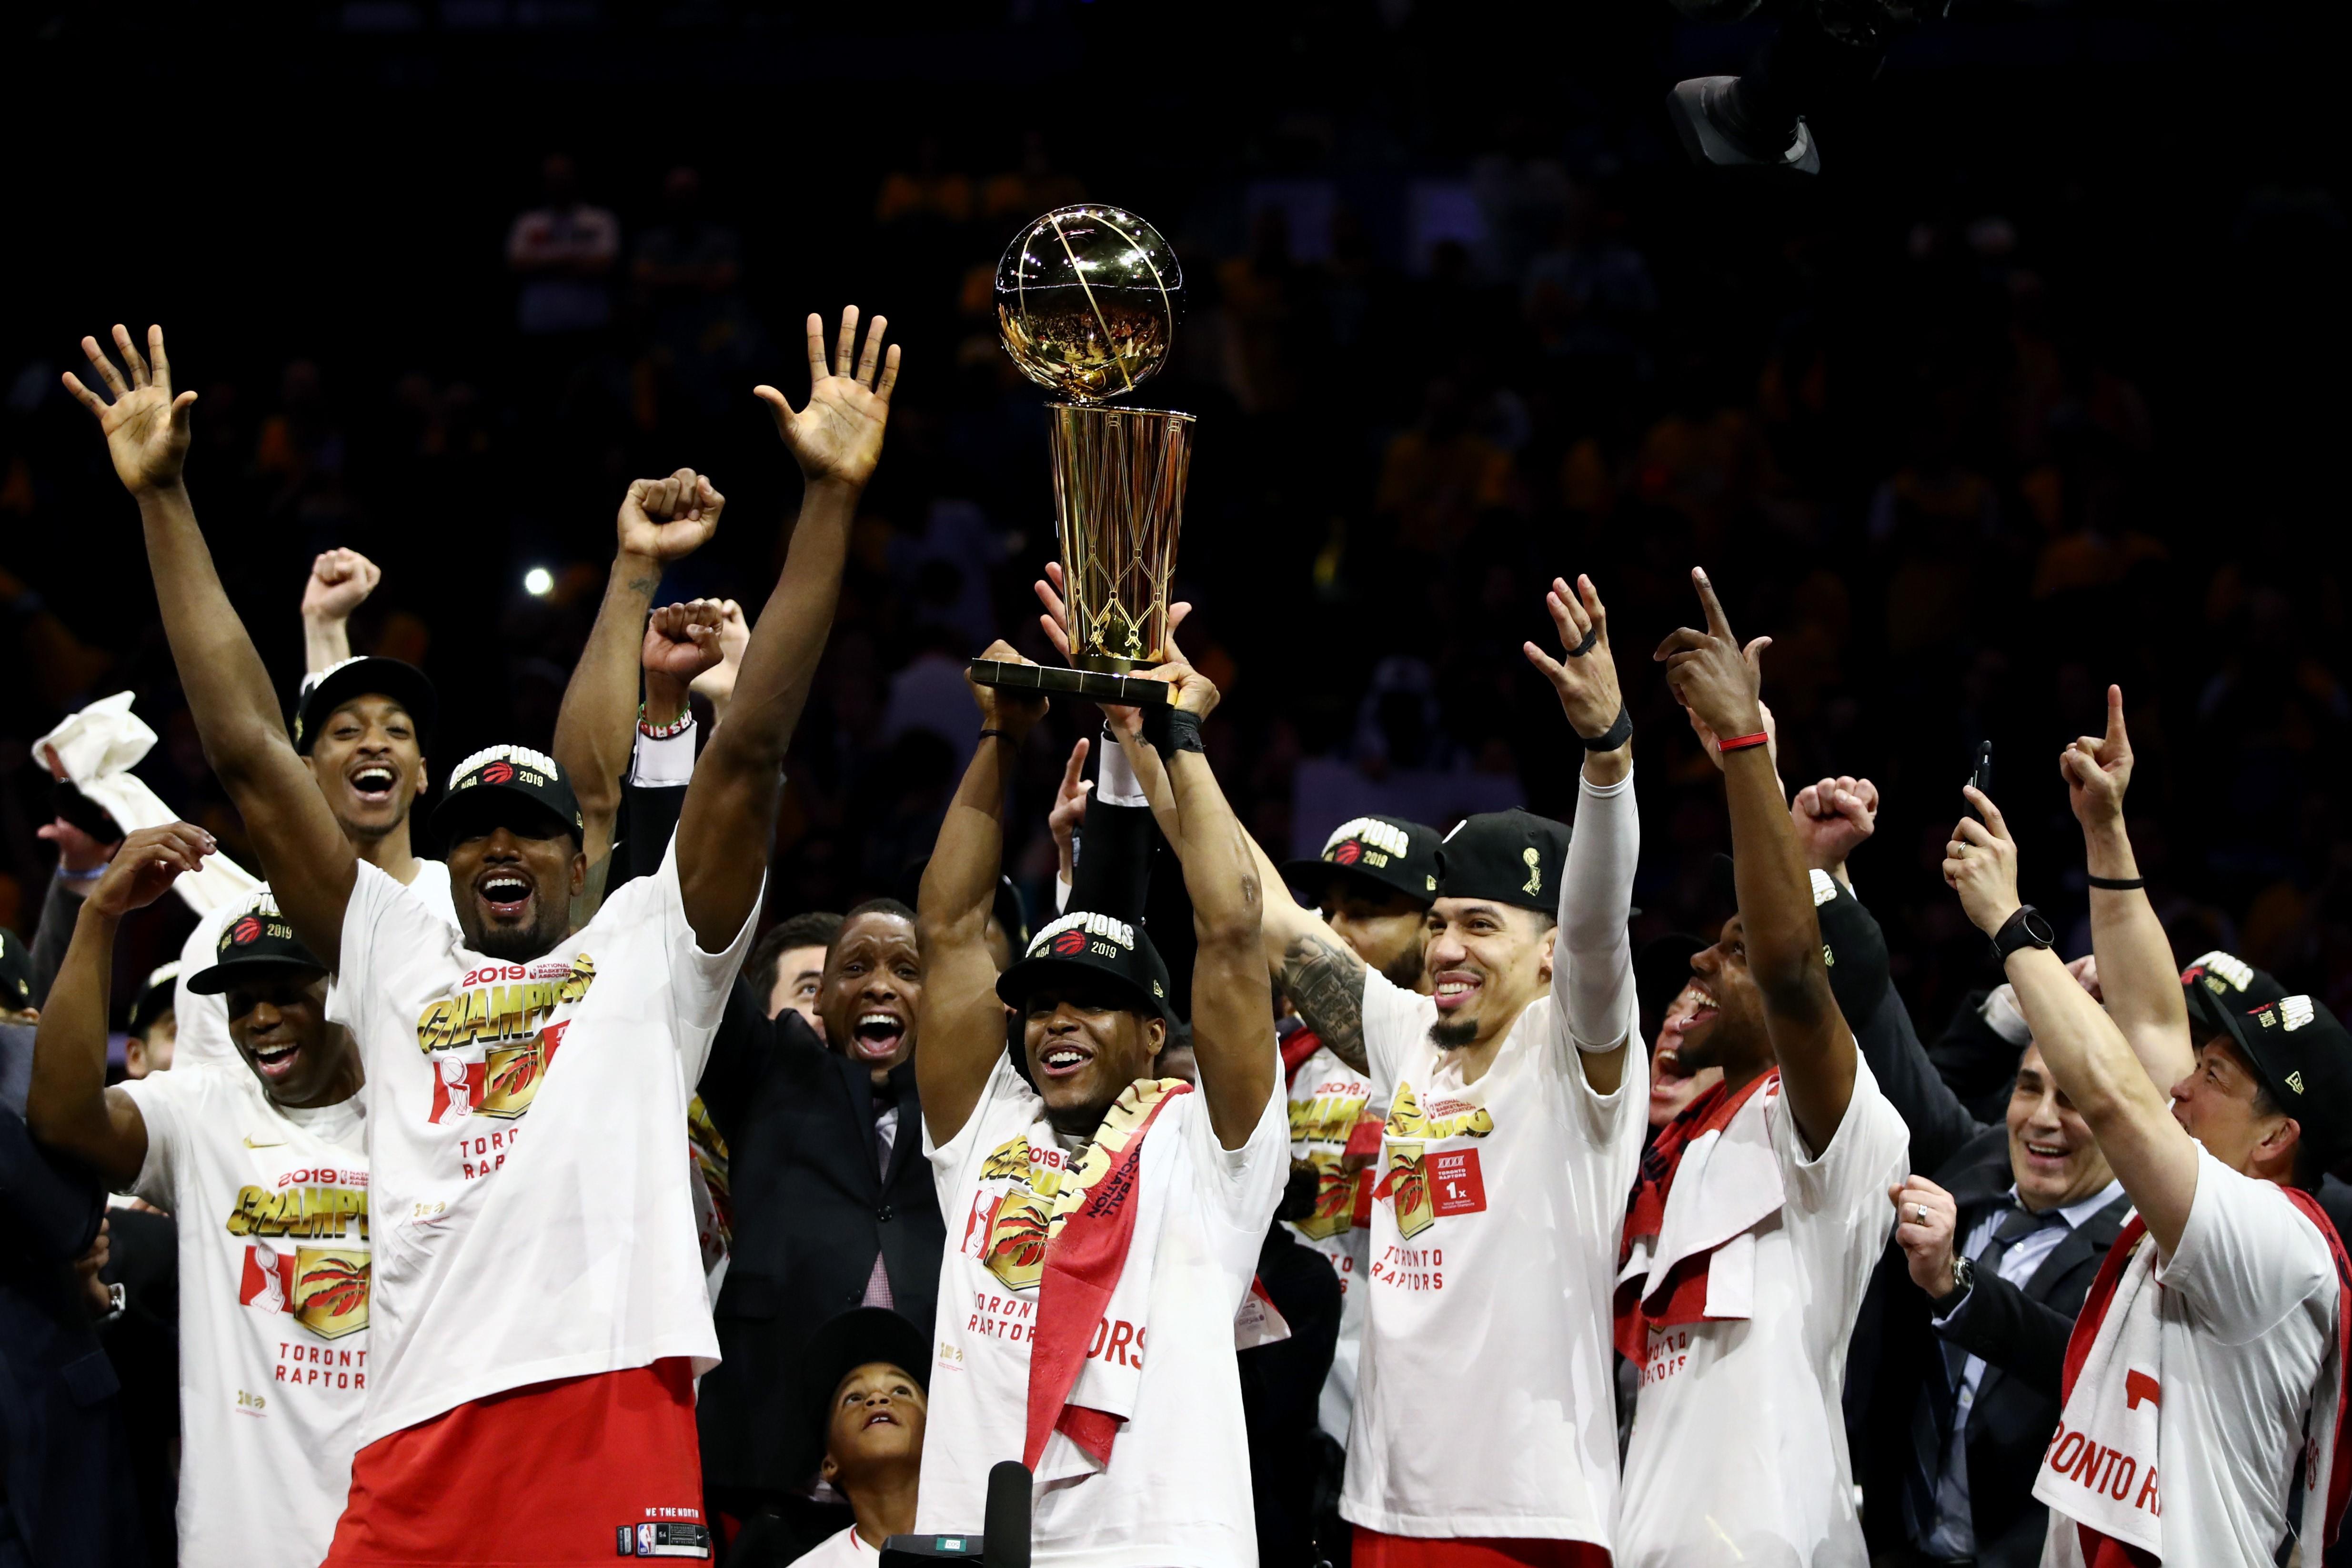 Kawhi Leonard et Toronto Raptors champions NBA 2019